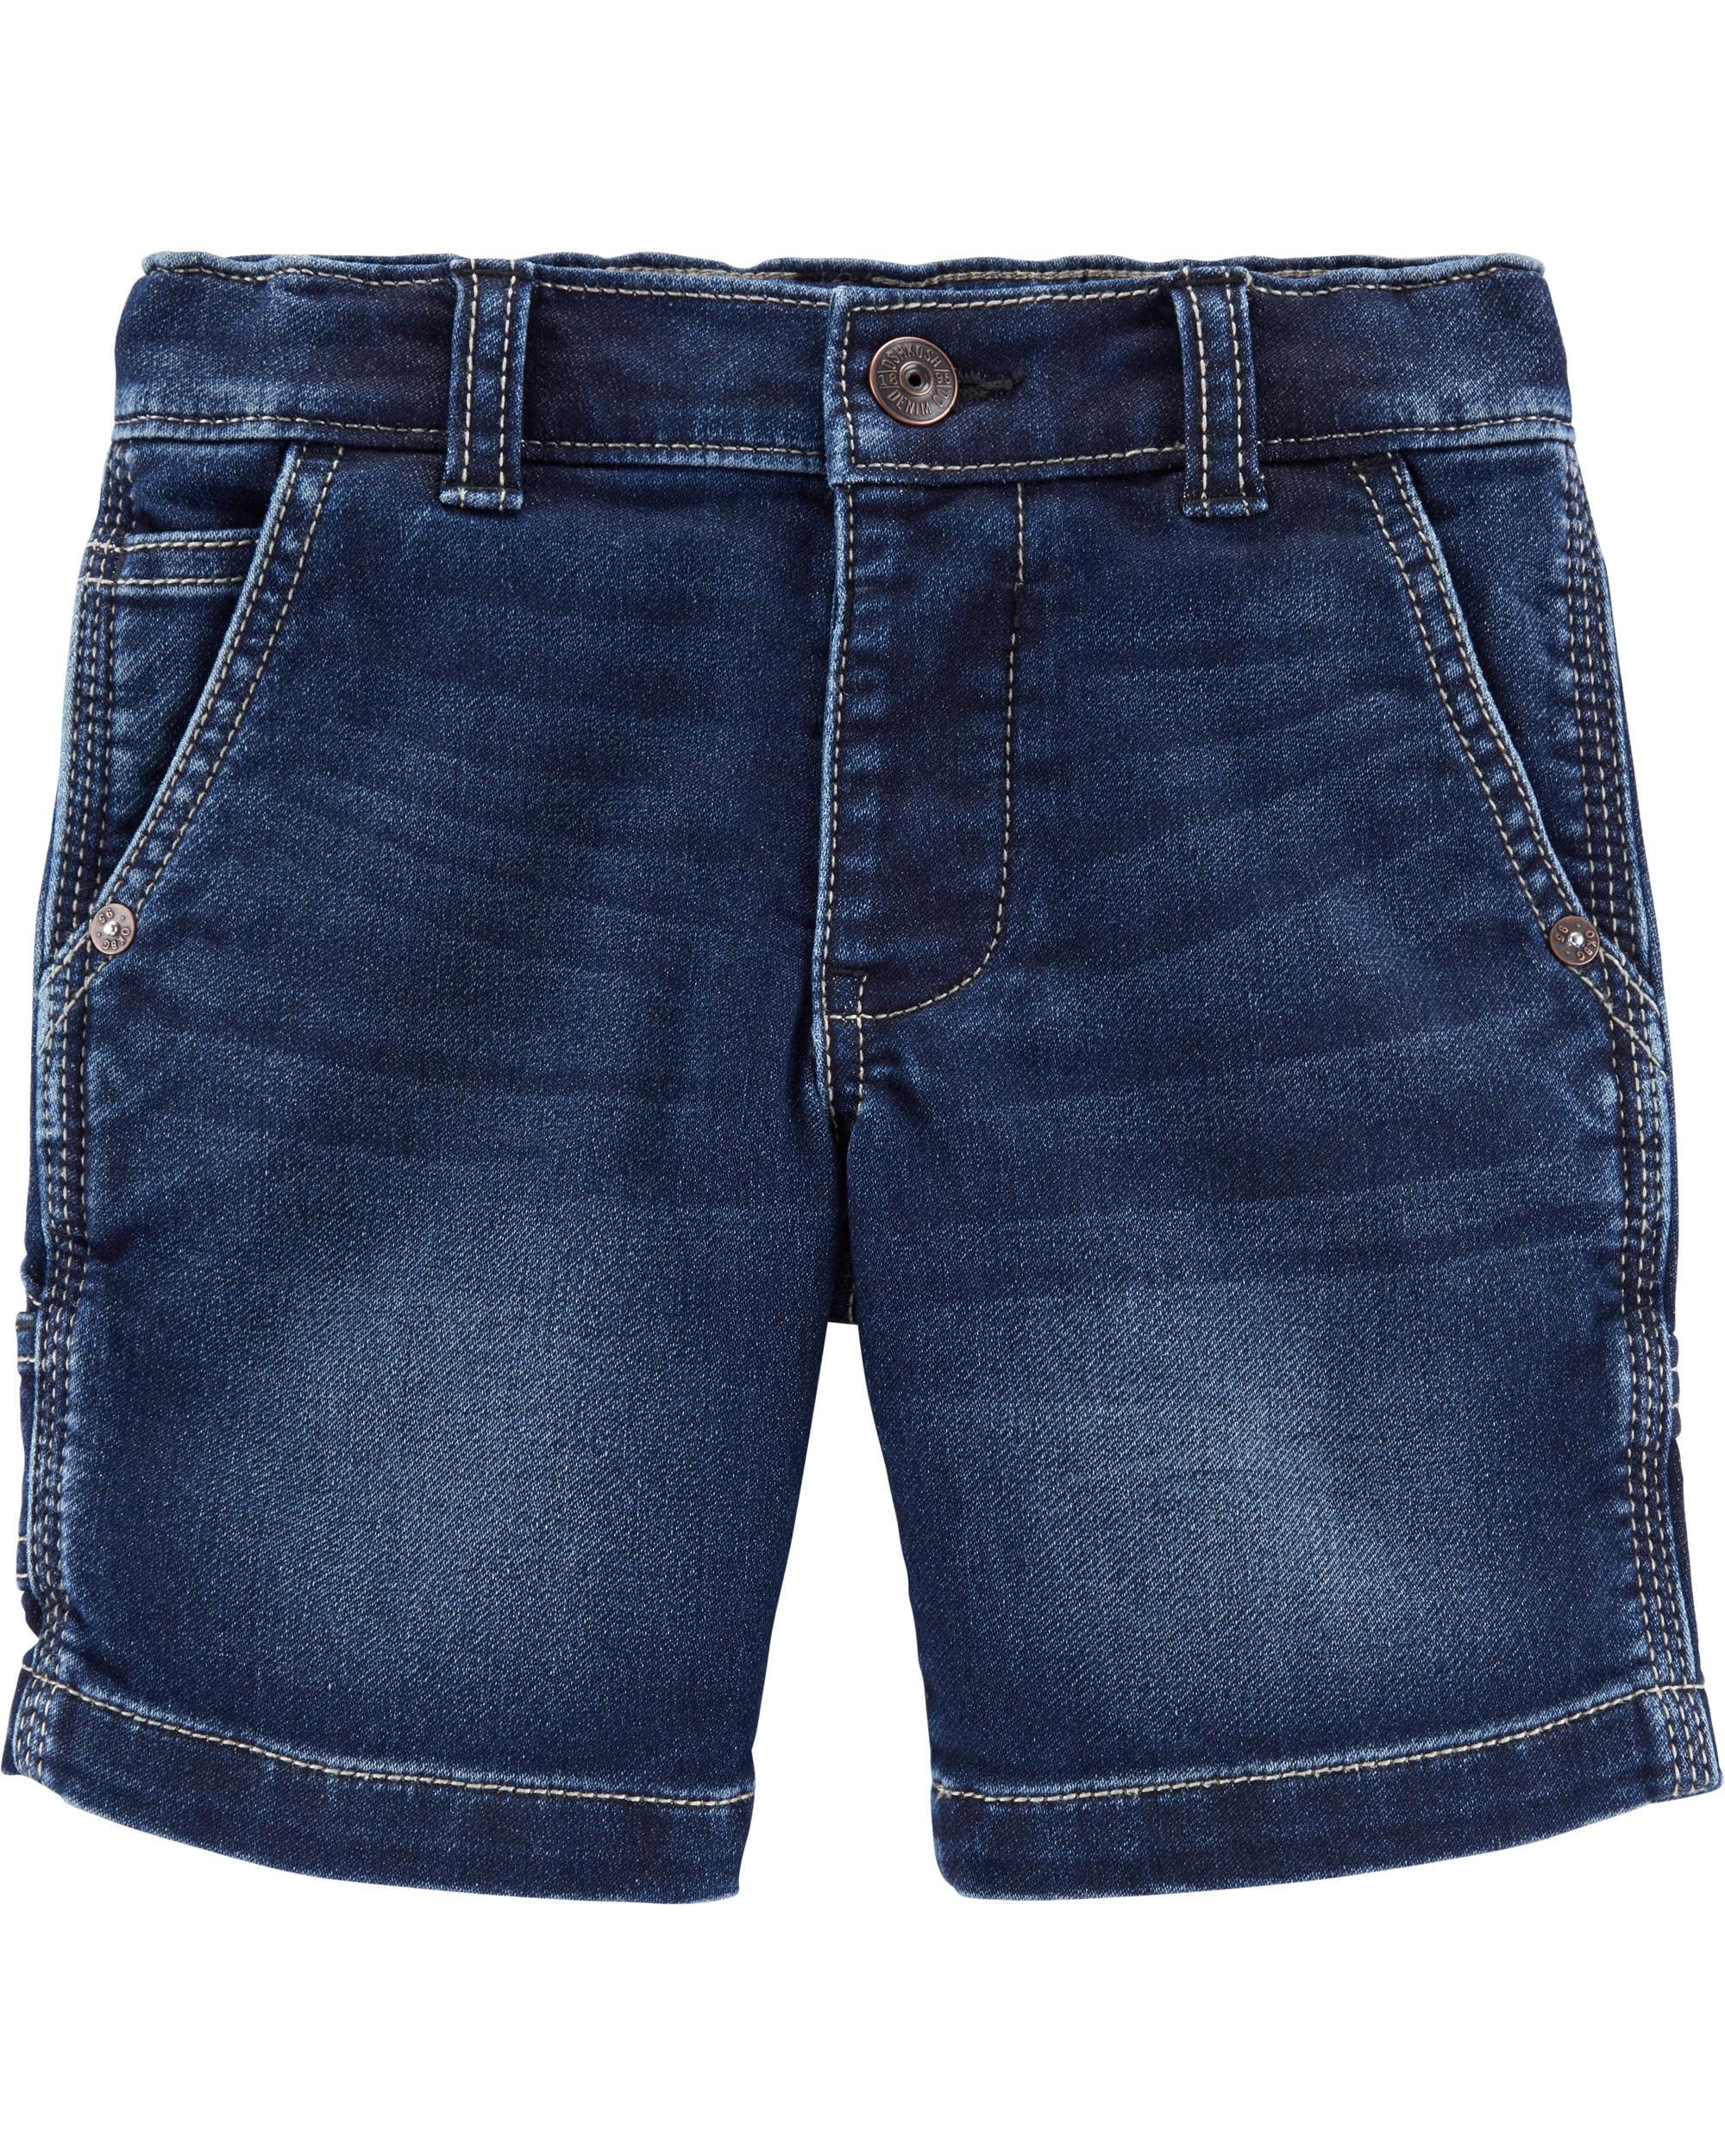 Oshkosh Pantaloni scurți denim indigo imagine